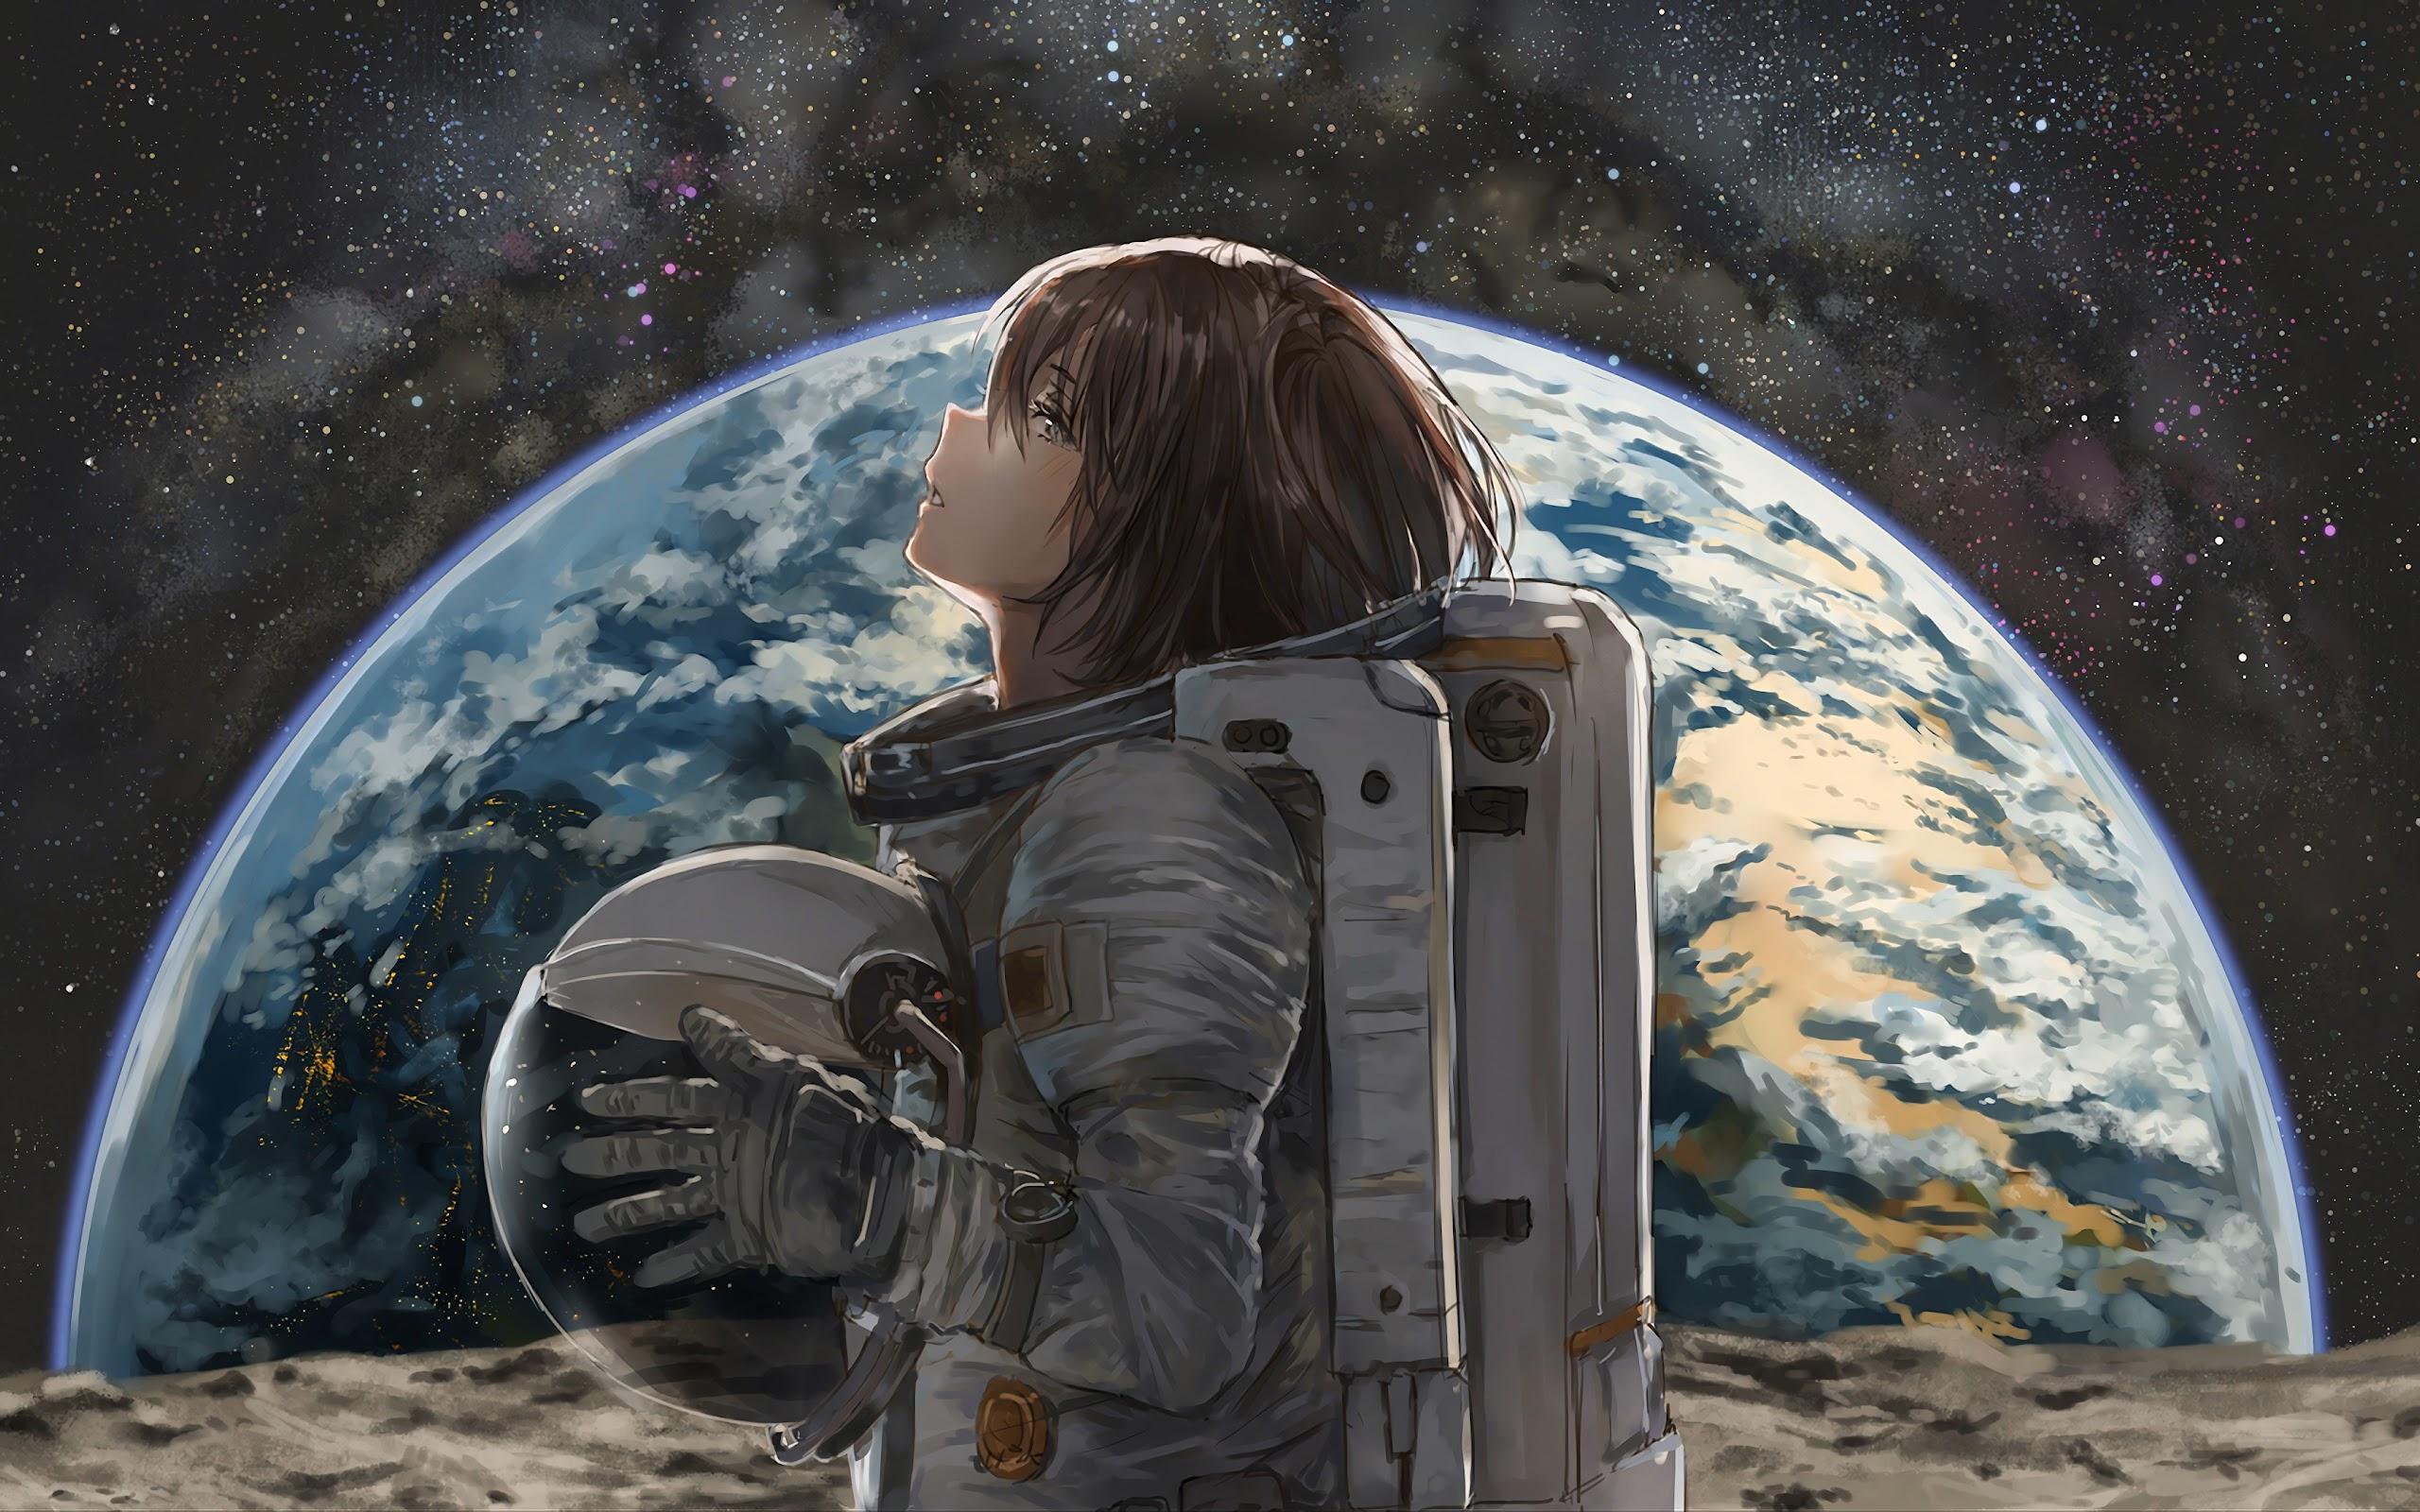 Space Astronaut Anime Girl Earth 4k Wallpaper 19